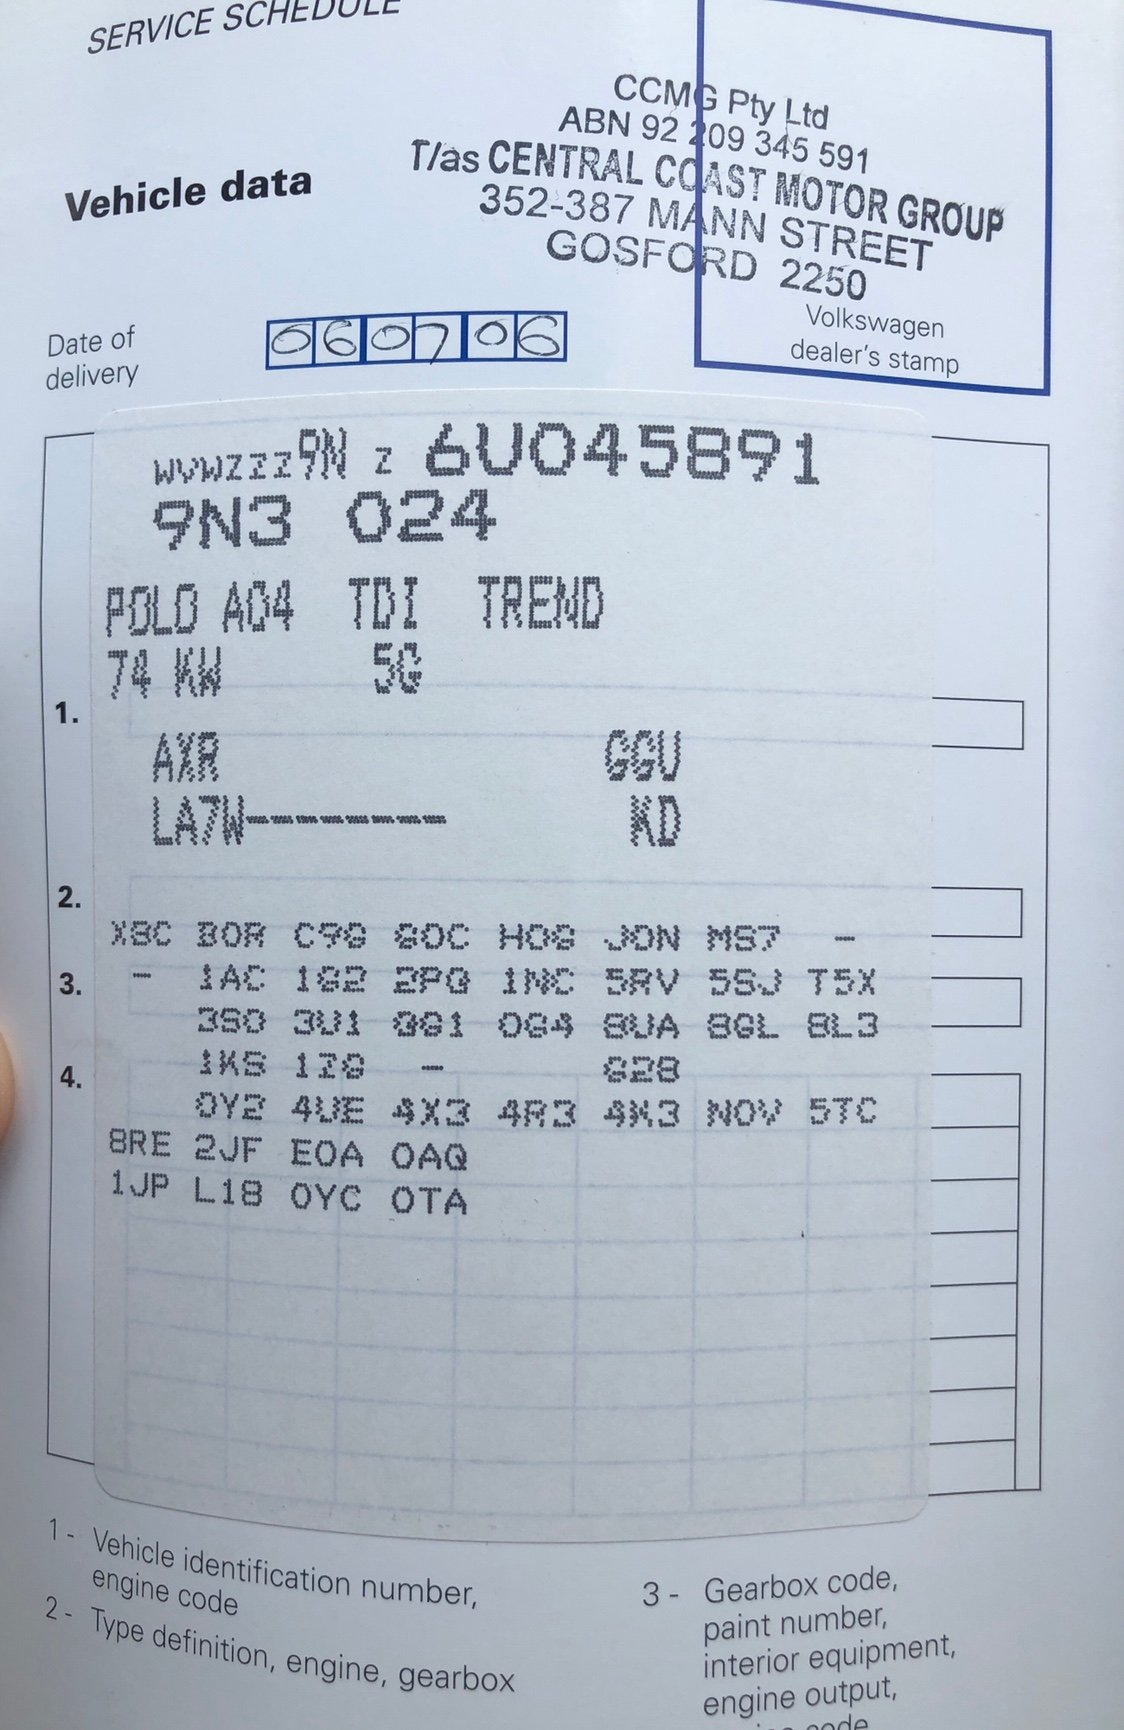 Engine oil list for TDI diesel | VW TDI forum, Audi, Porsche